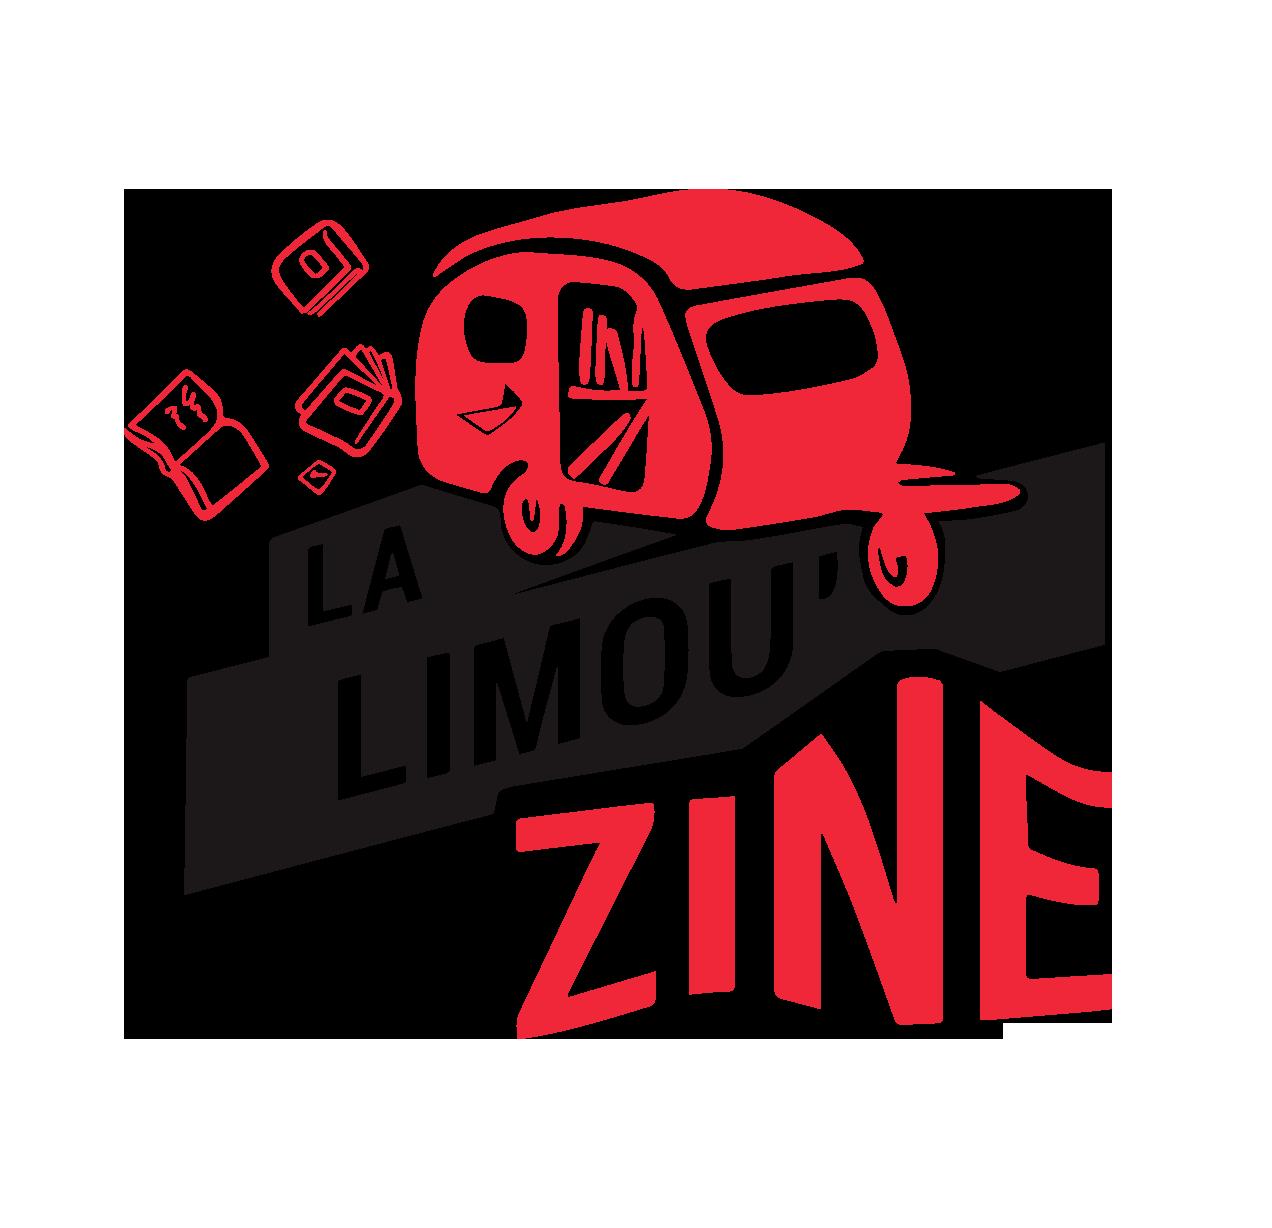 La Limou'Zine